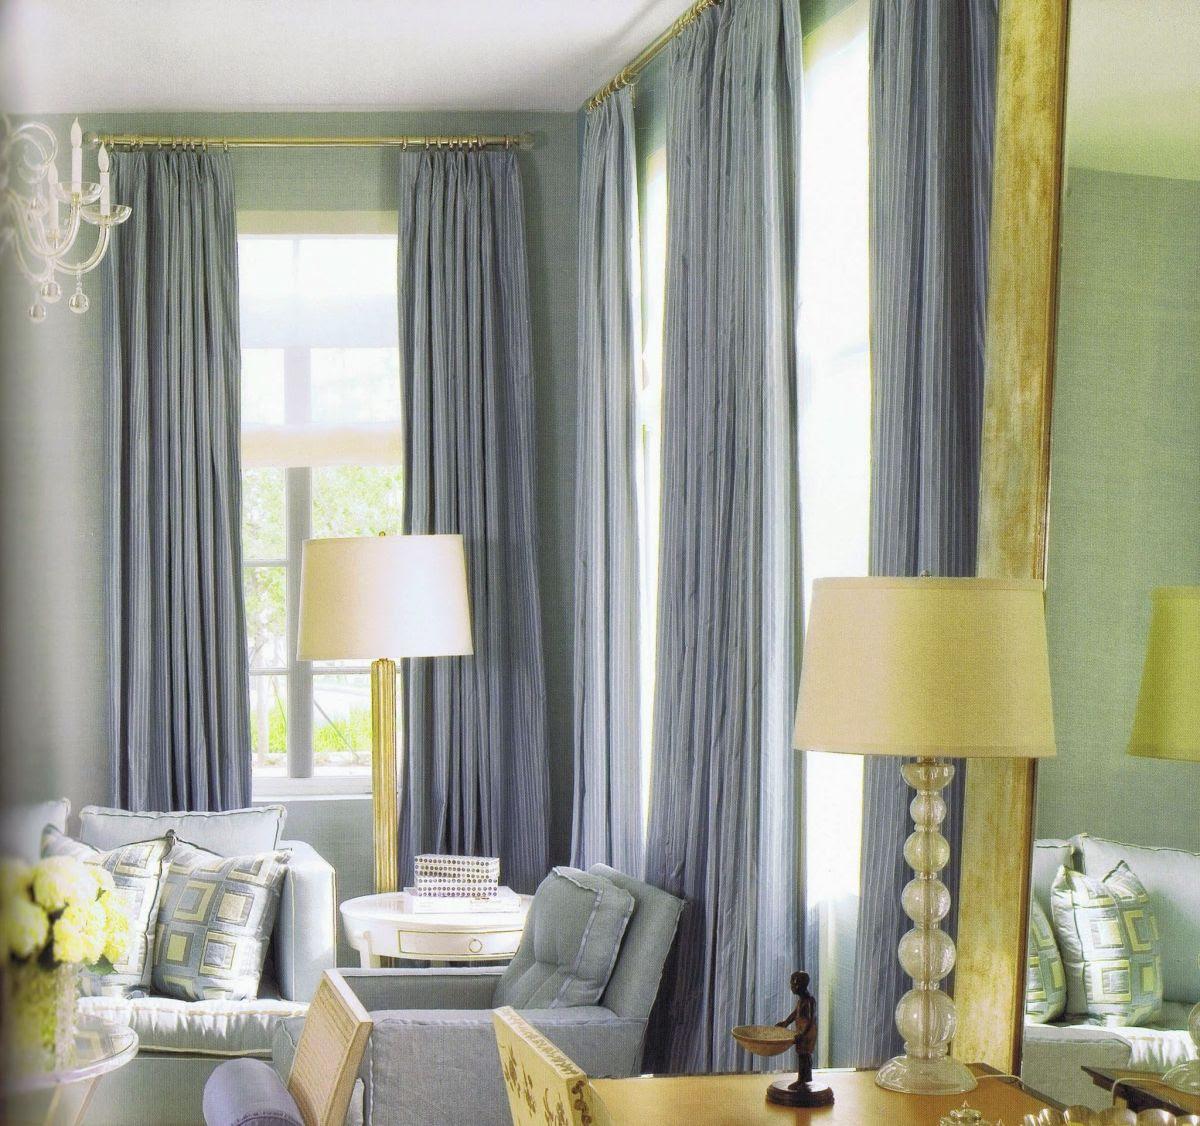 Top 10 Room Color Scheme 2017 - Interior Decorating Colors ...